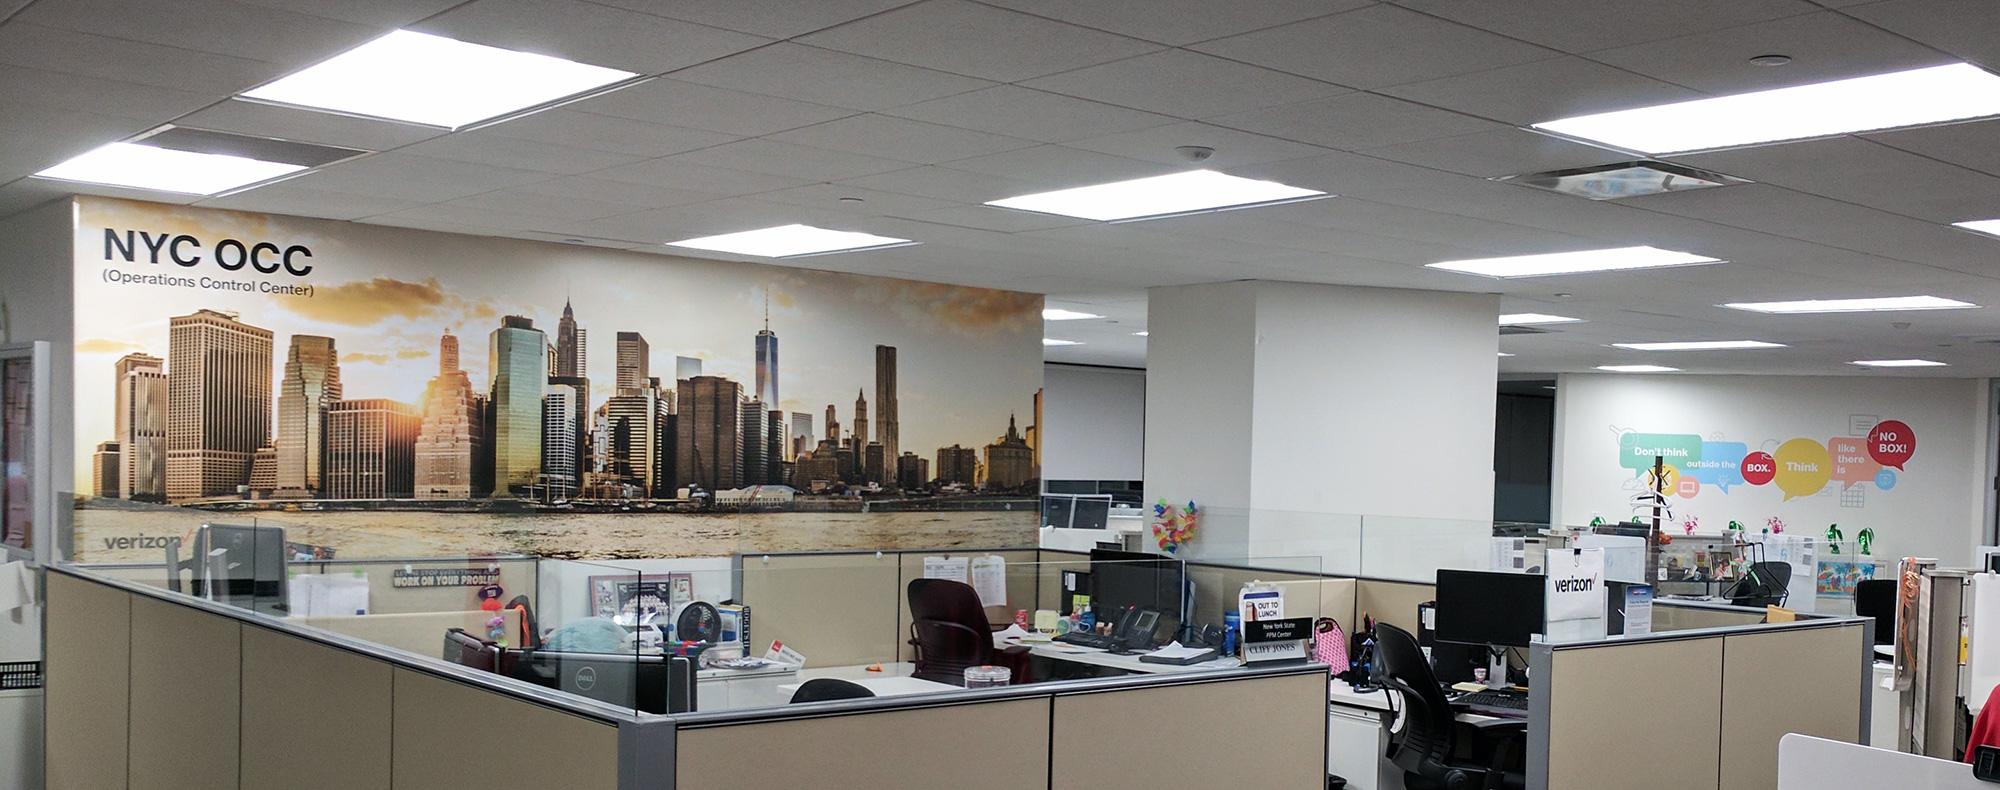 New Your City Mural | Verizon | Digital Printing | Boston, Medford